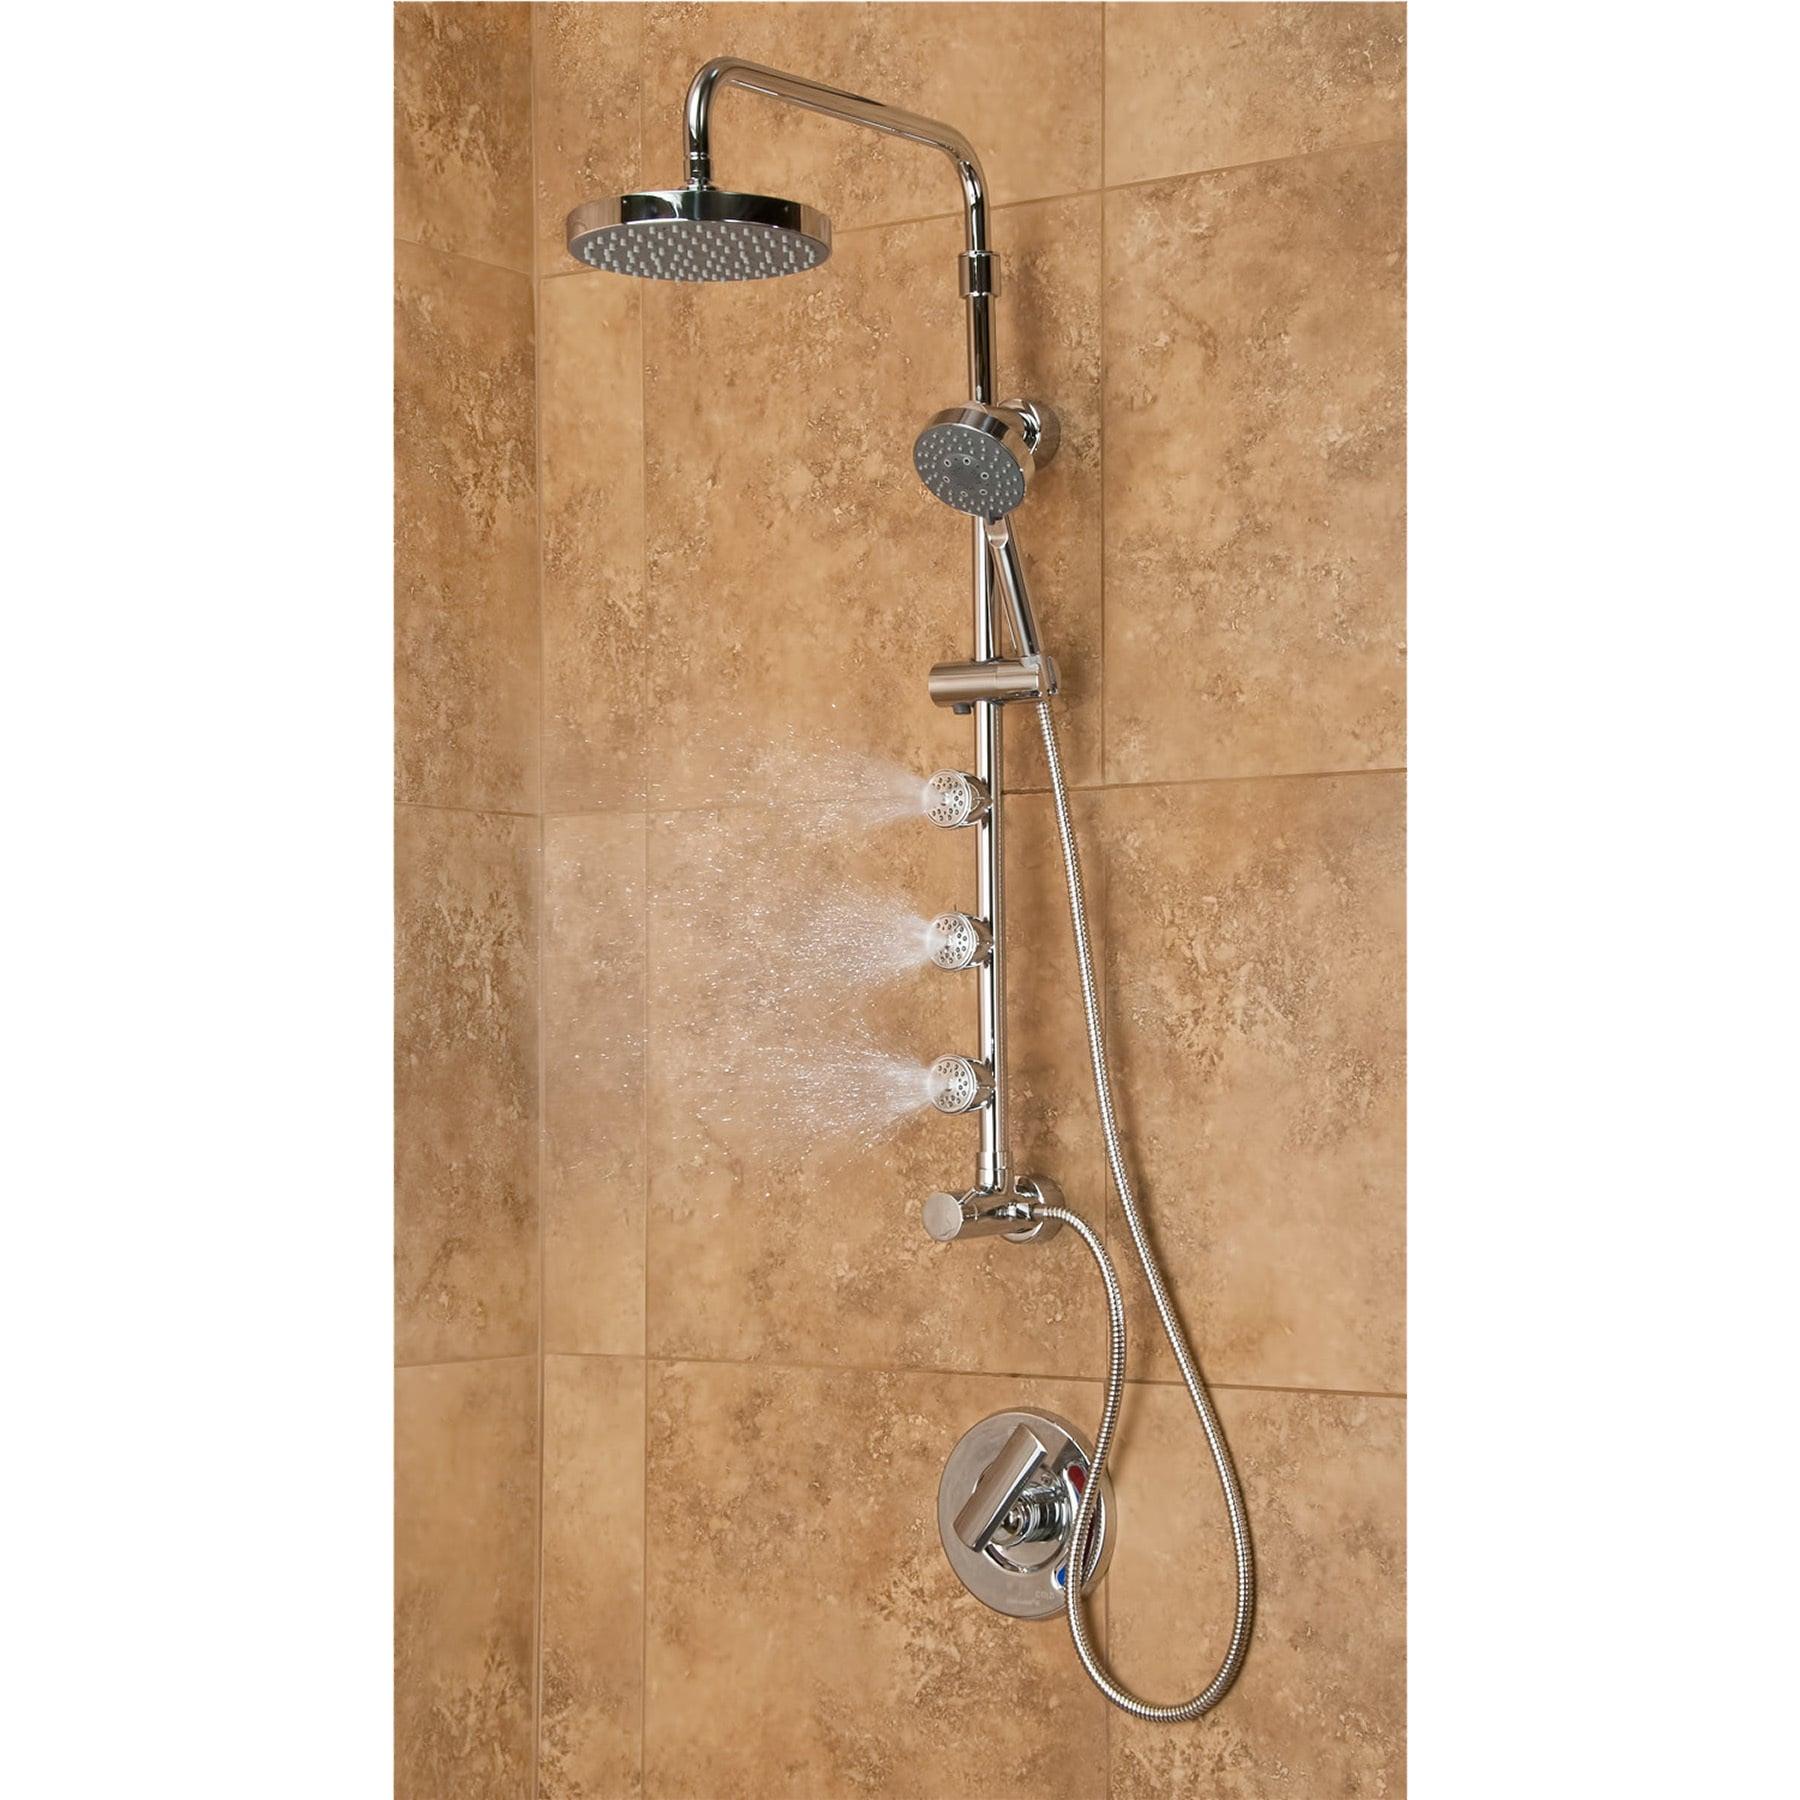 shower bar system. Shop Pulse Lanikai Shower System - Free Shipping Today Overstock.com 9128314 Bar